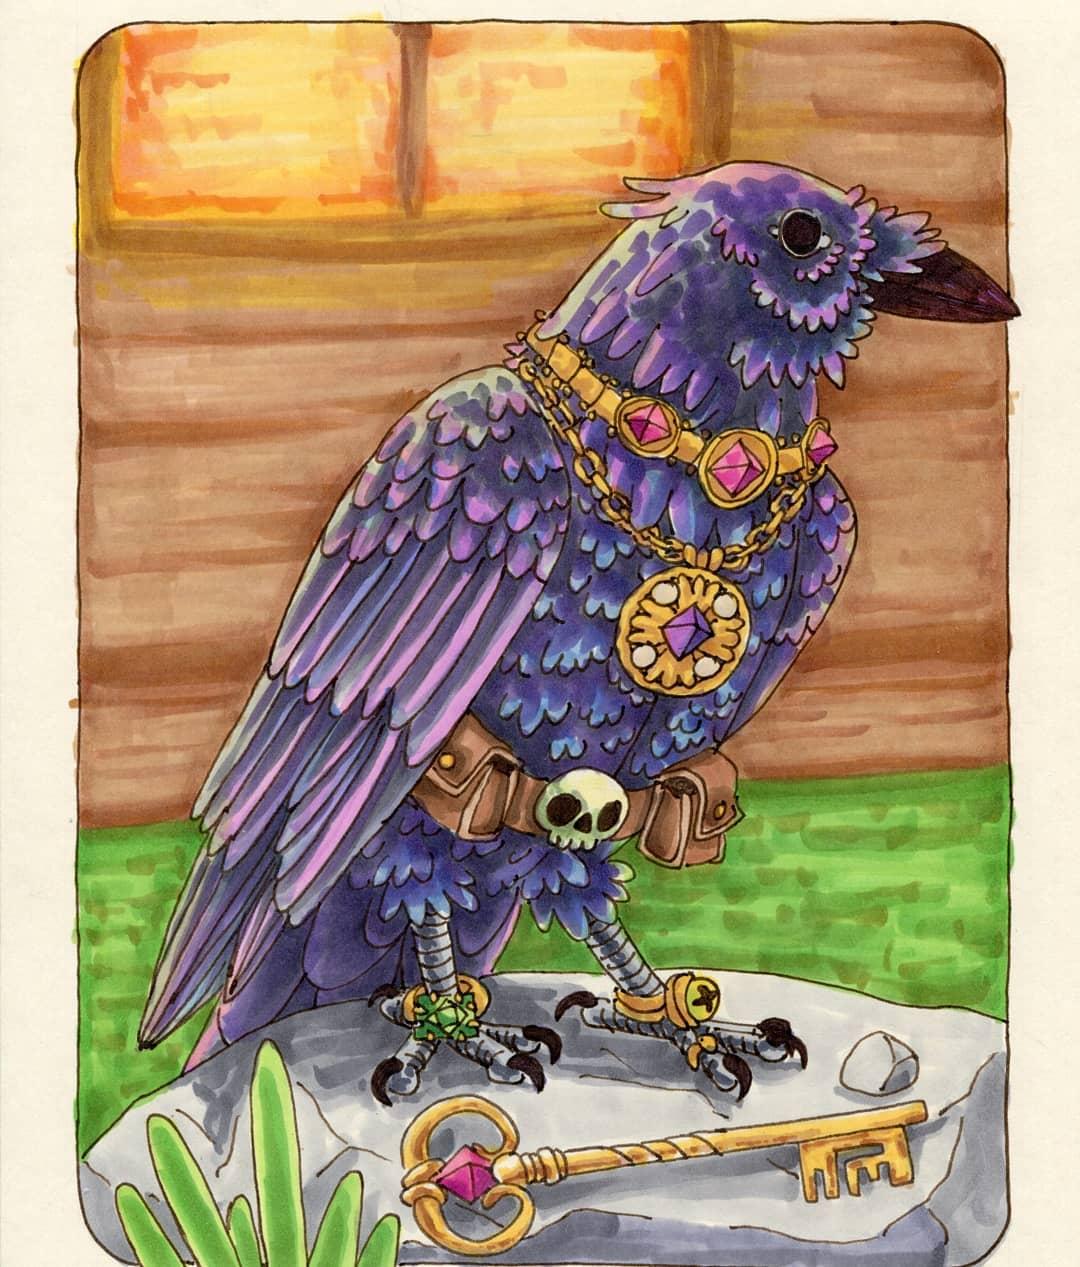 "redjarojam ""Crow"" - by Jared DeCosta (redjarojam) www.instagram.com/redjarojam (2016-2019) © dell'autore tutti i diritti riservati"